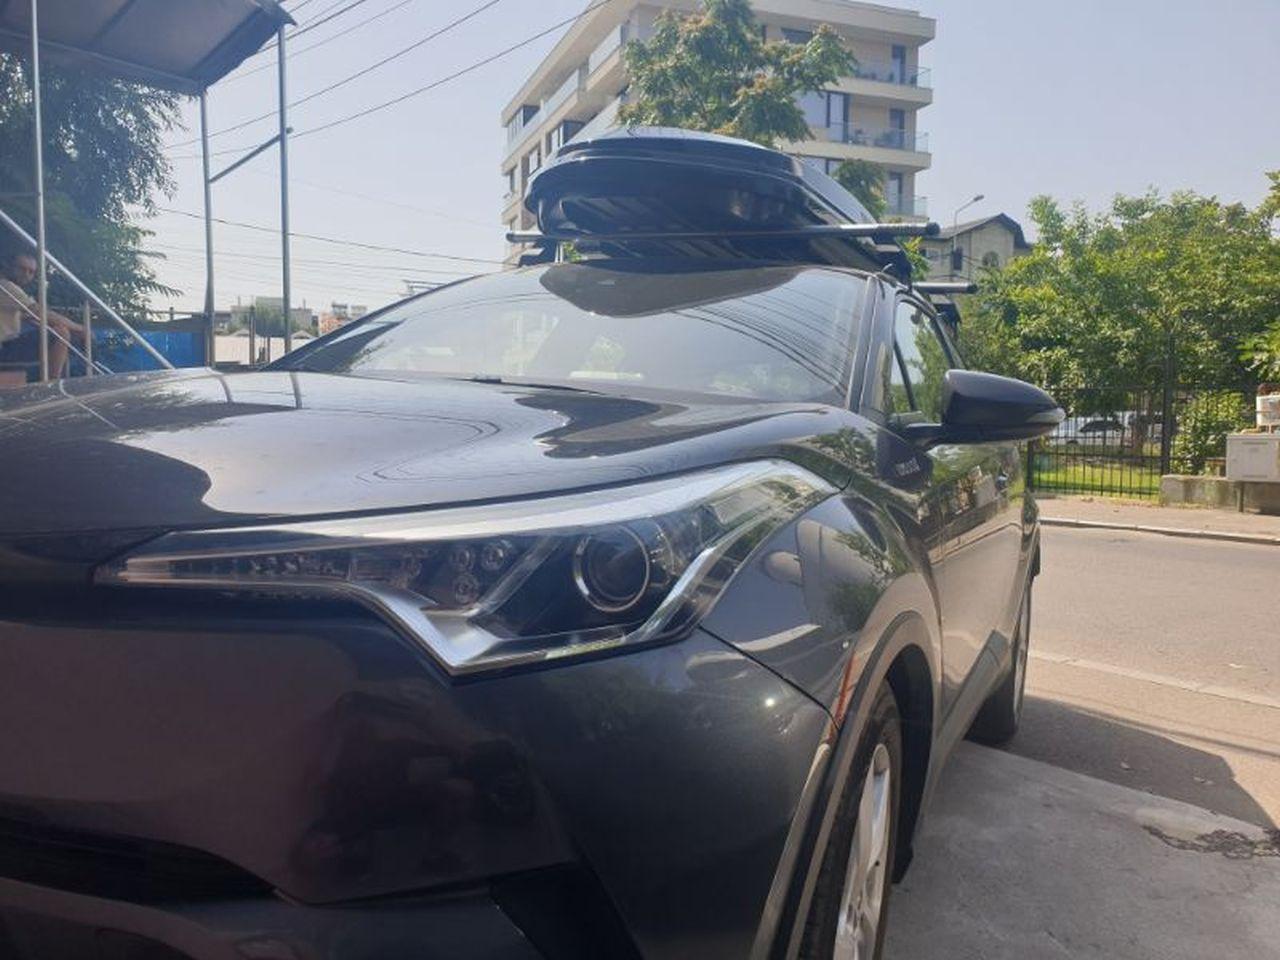 Toyota C-HR bare transversale Menabo Tema si cutie portbagaj Menabo Diamond